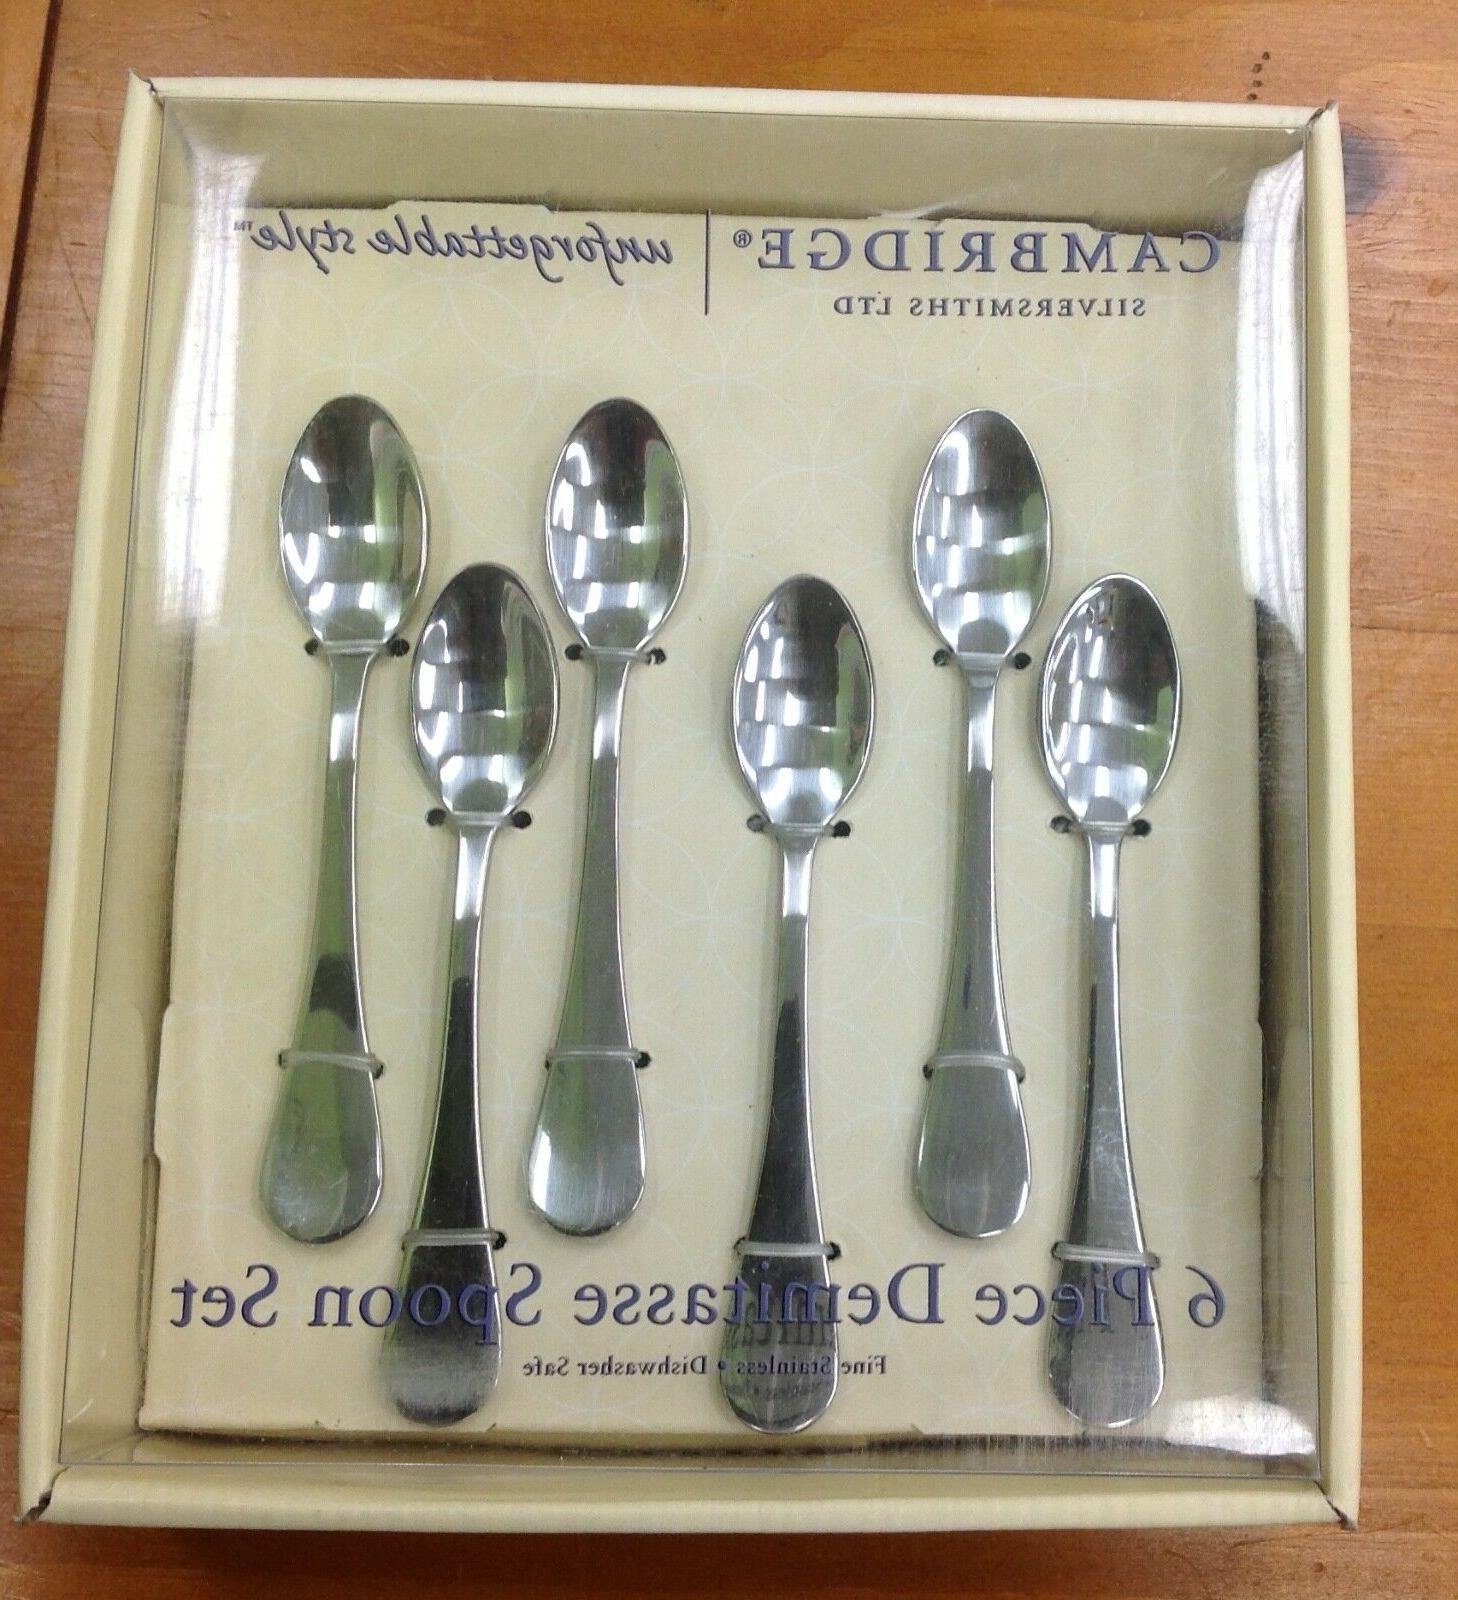 cambridge silversmiths 6 piece demitasse spoon set